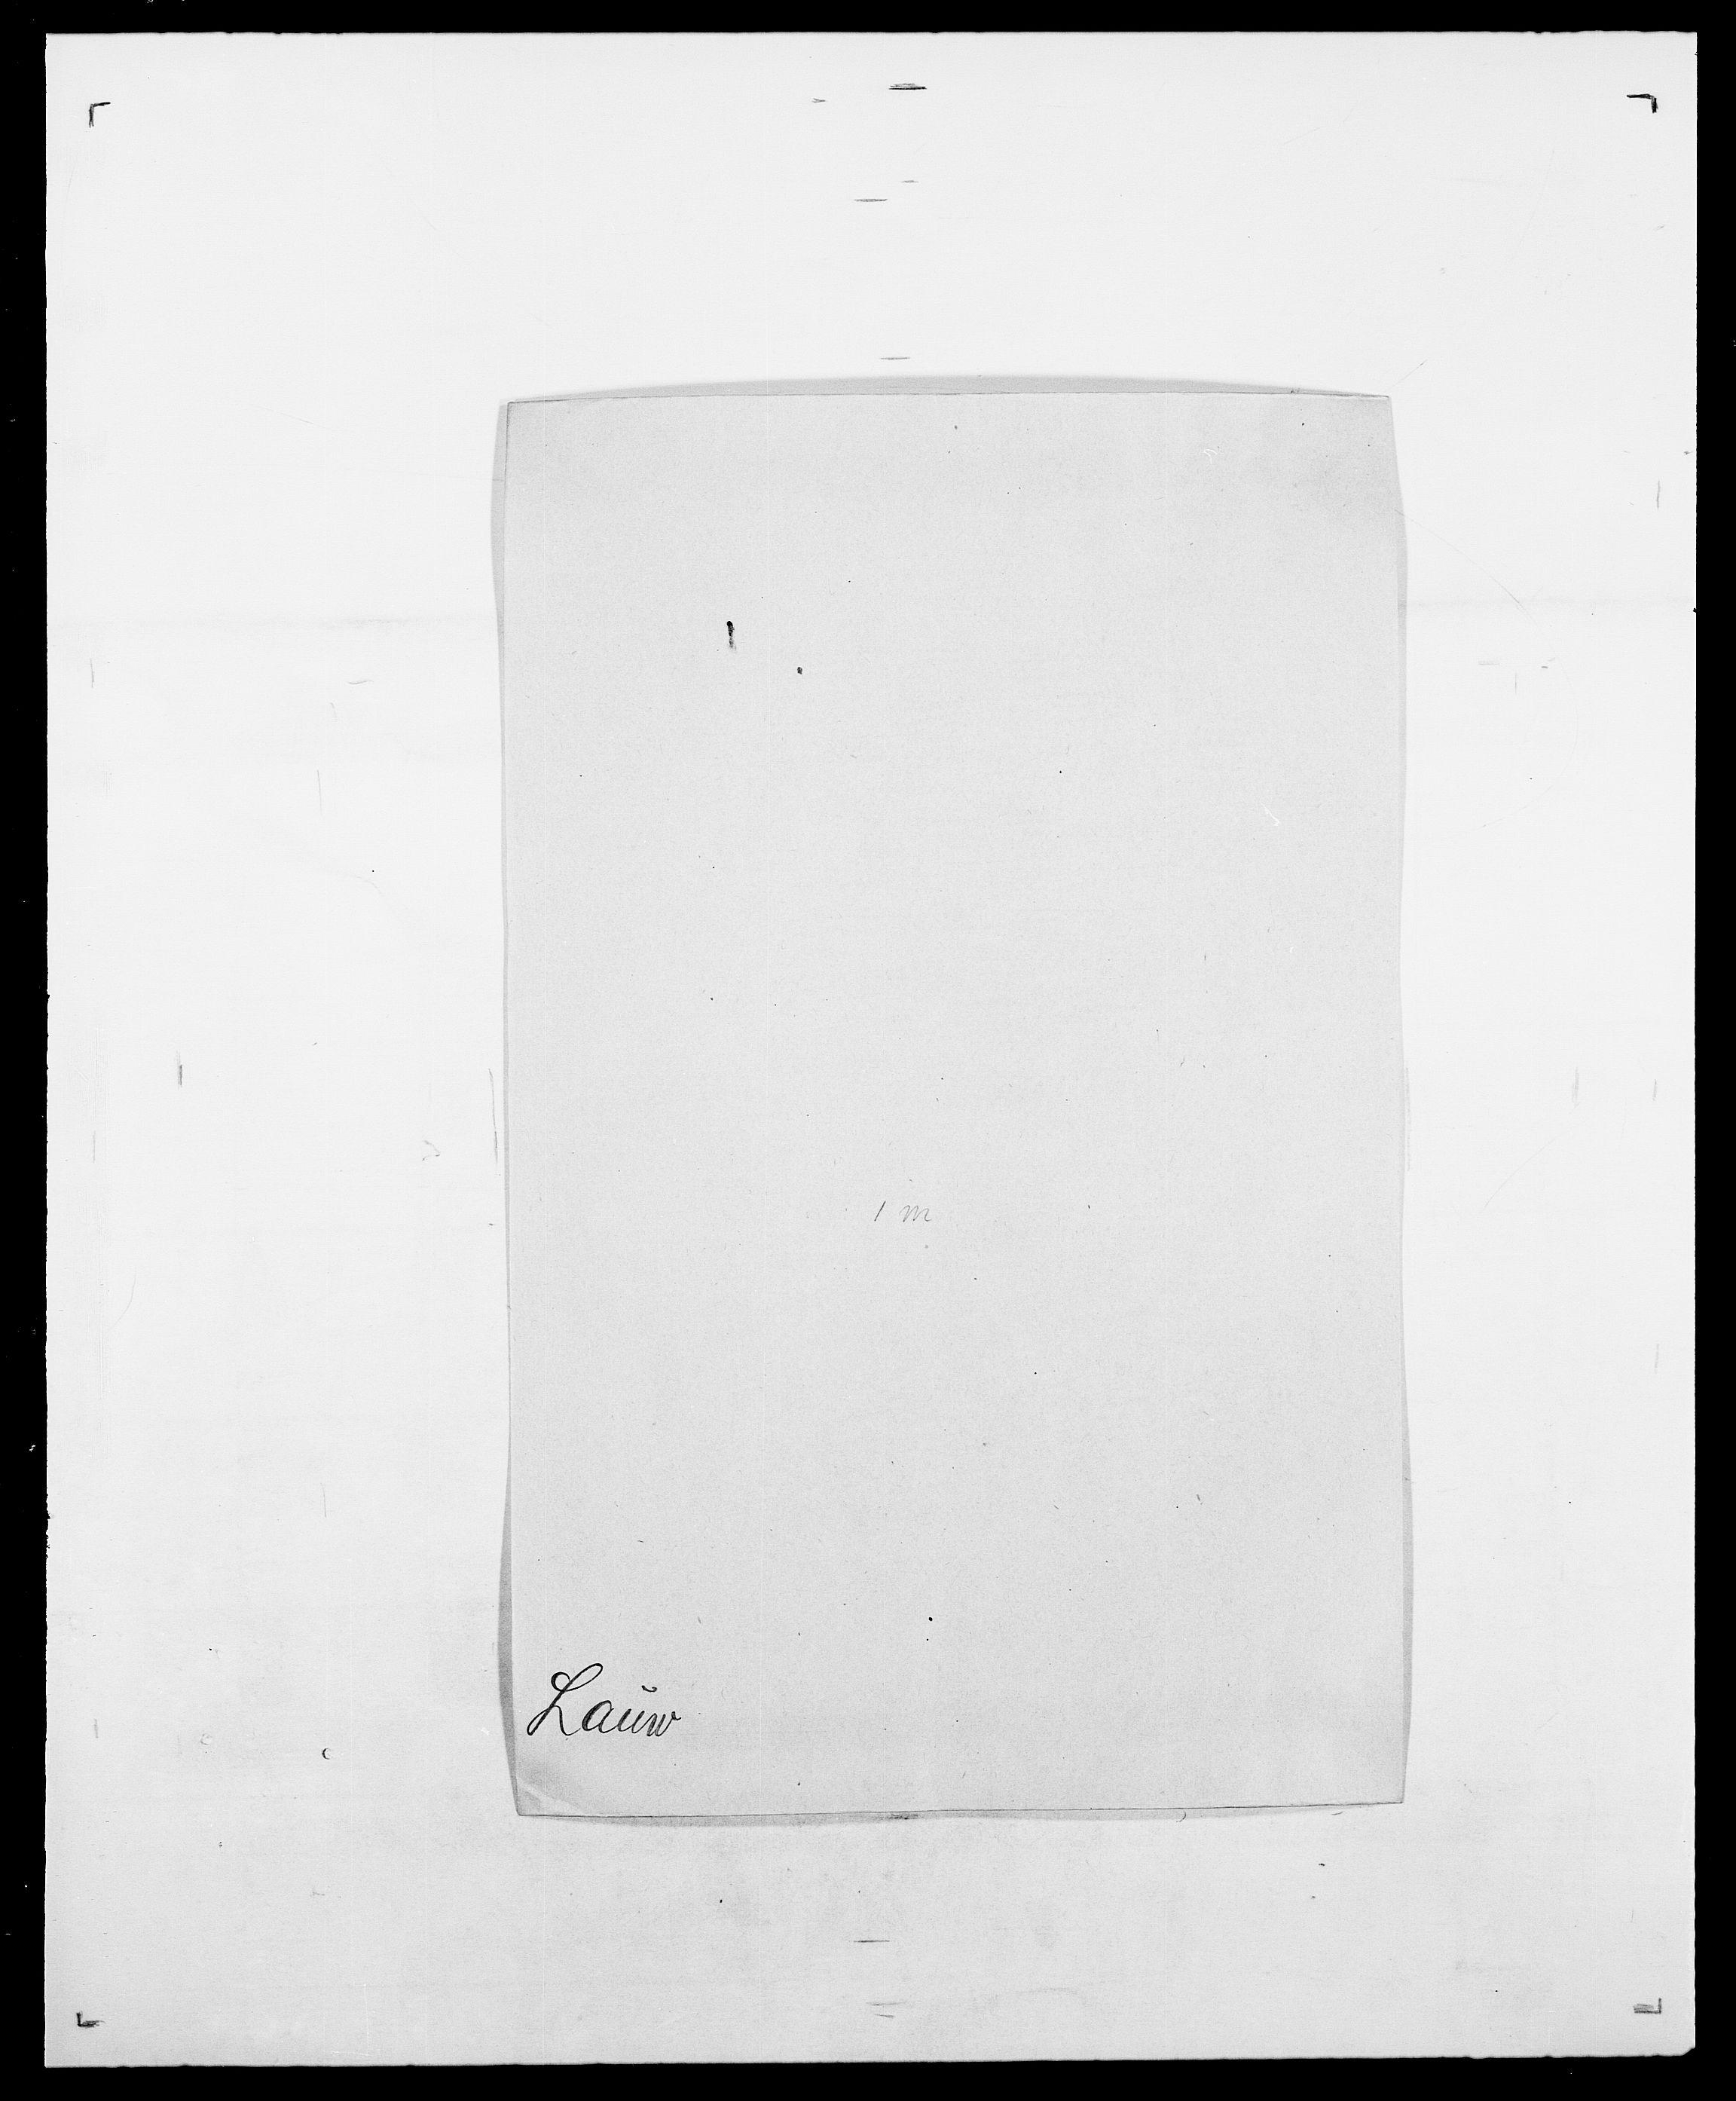 SAO, Delgobe, Charles Antoine - samling, D/Da/L0023: Lau - Lirvyn, s. 30